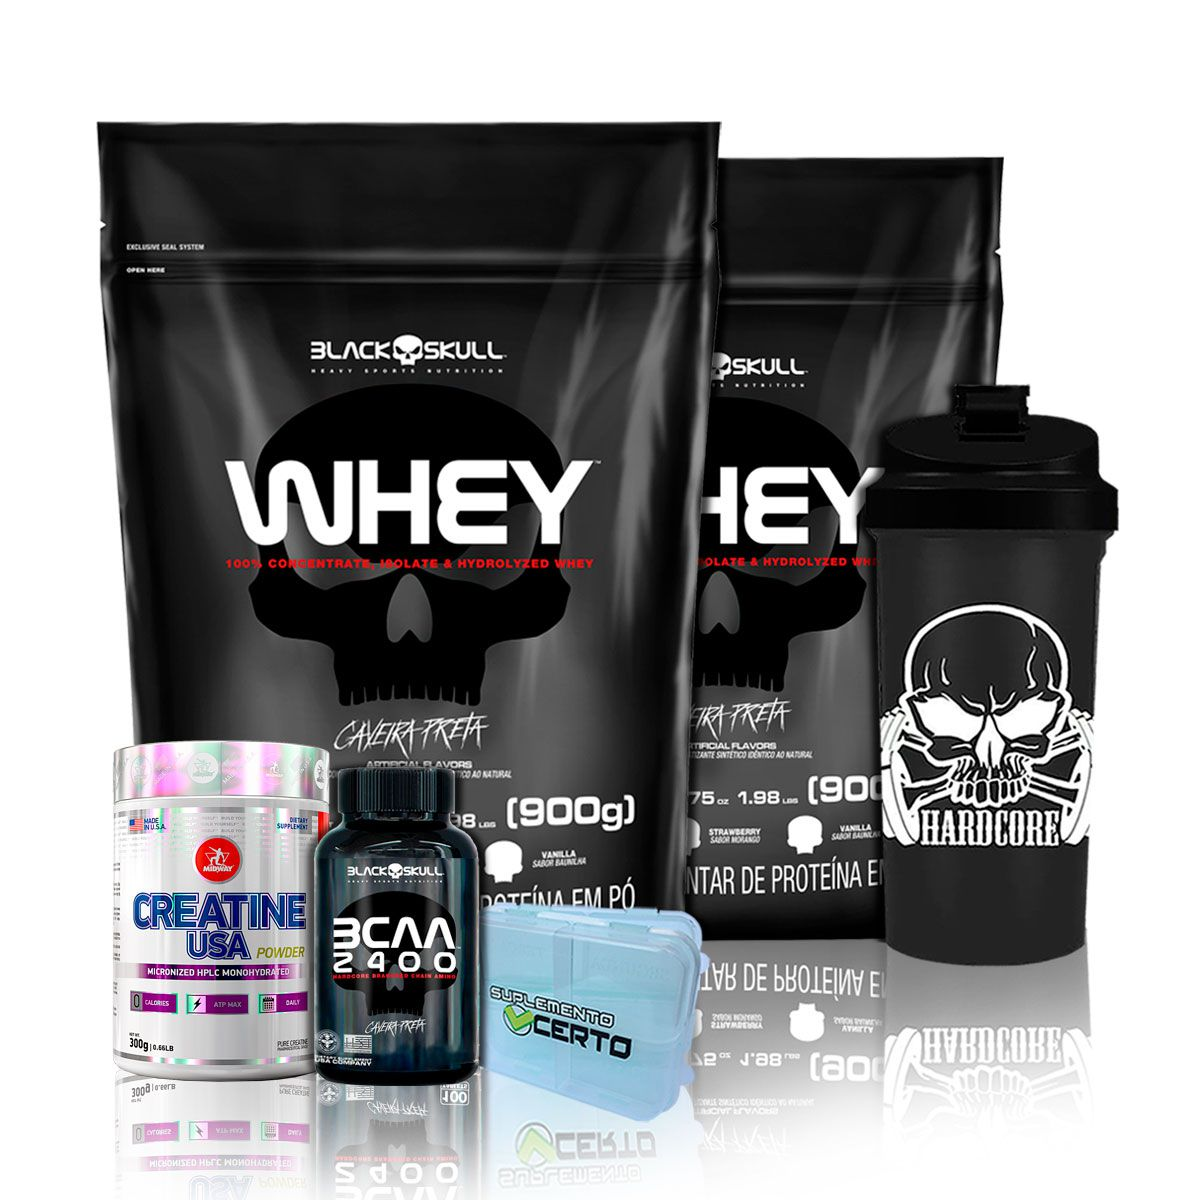 Kit 2x Whey 900g + Bcaa 30 Tabs + Creatina 300g + Brindes - Black Skull/Midway